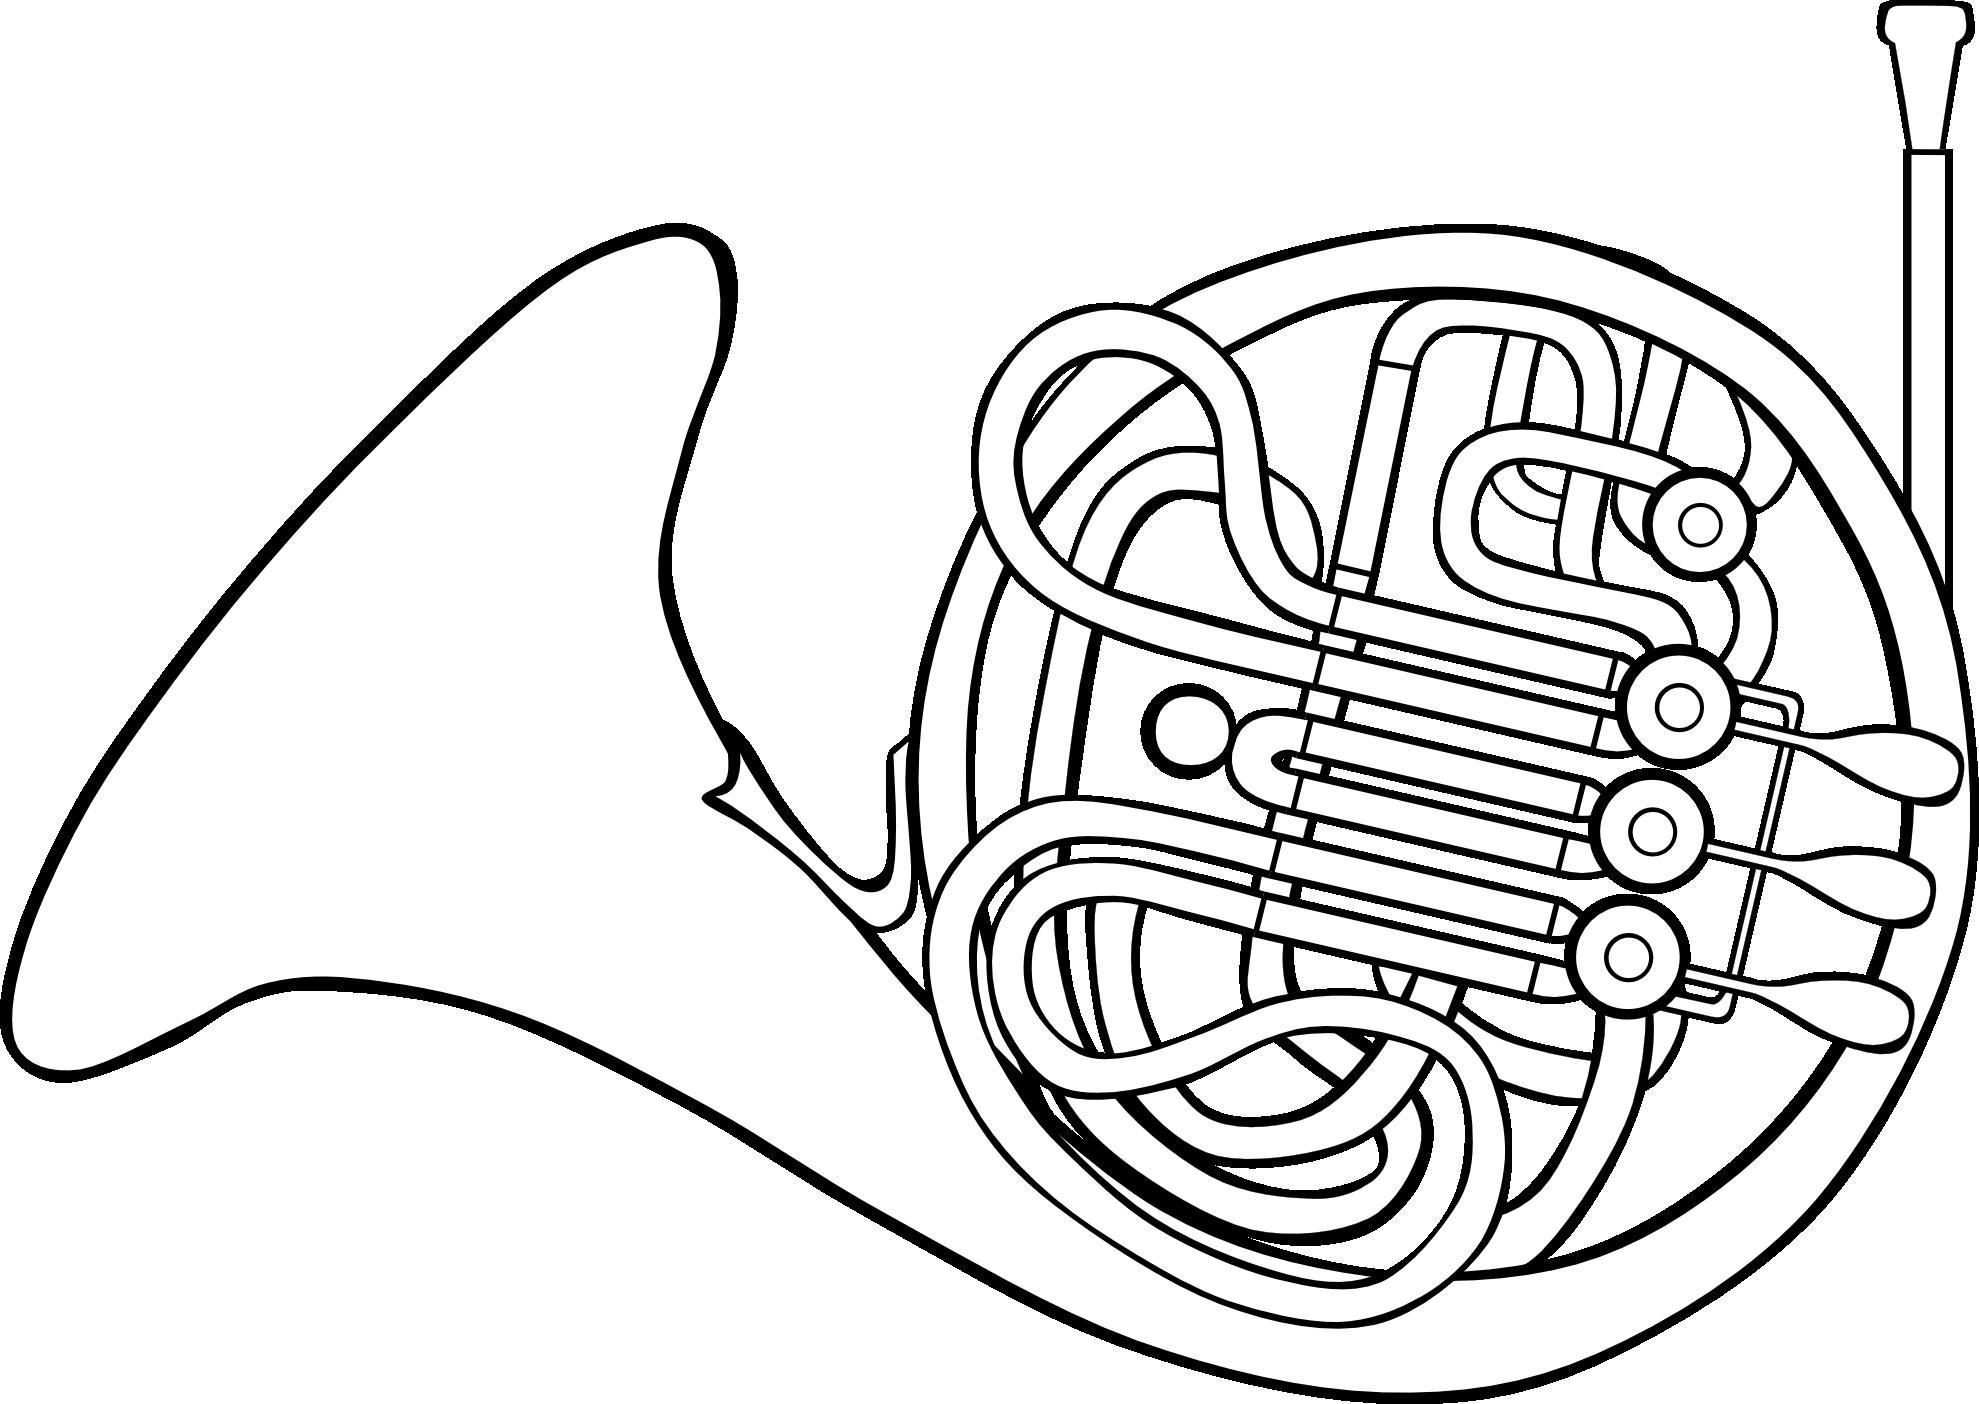 Clip Art French Horn Clipart french horn clipart best etc gerald g svg